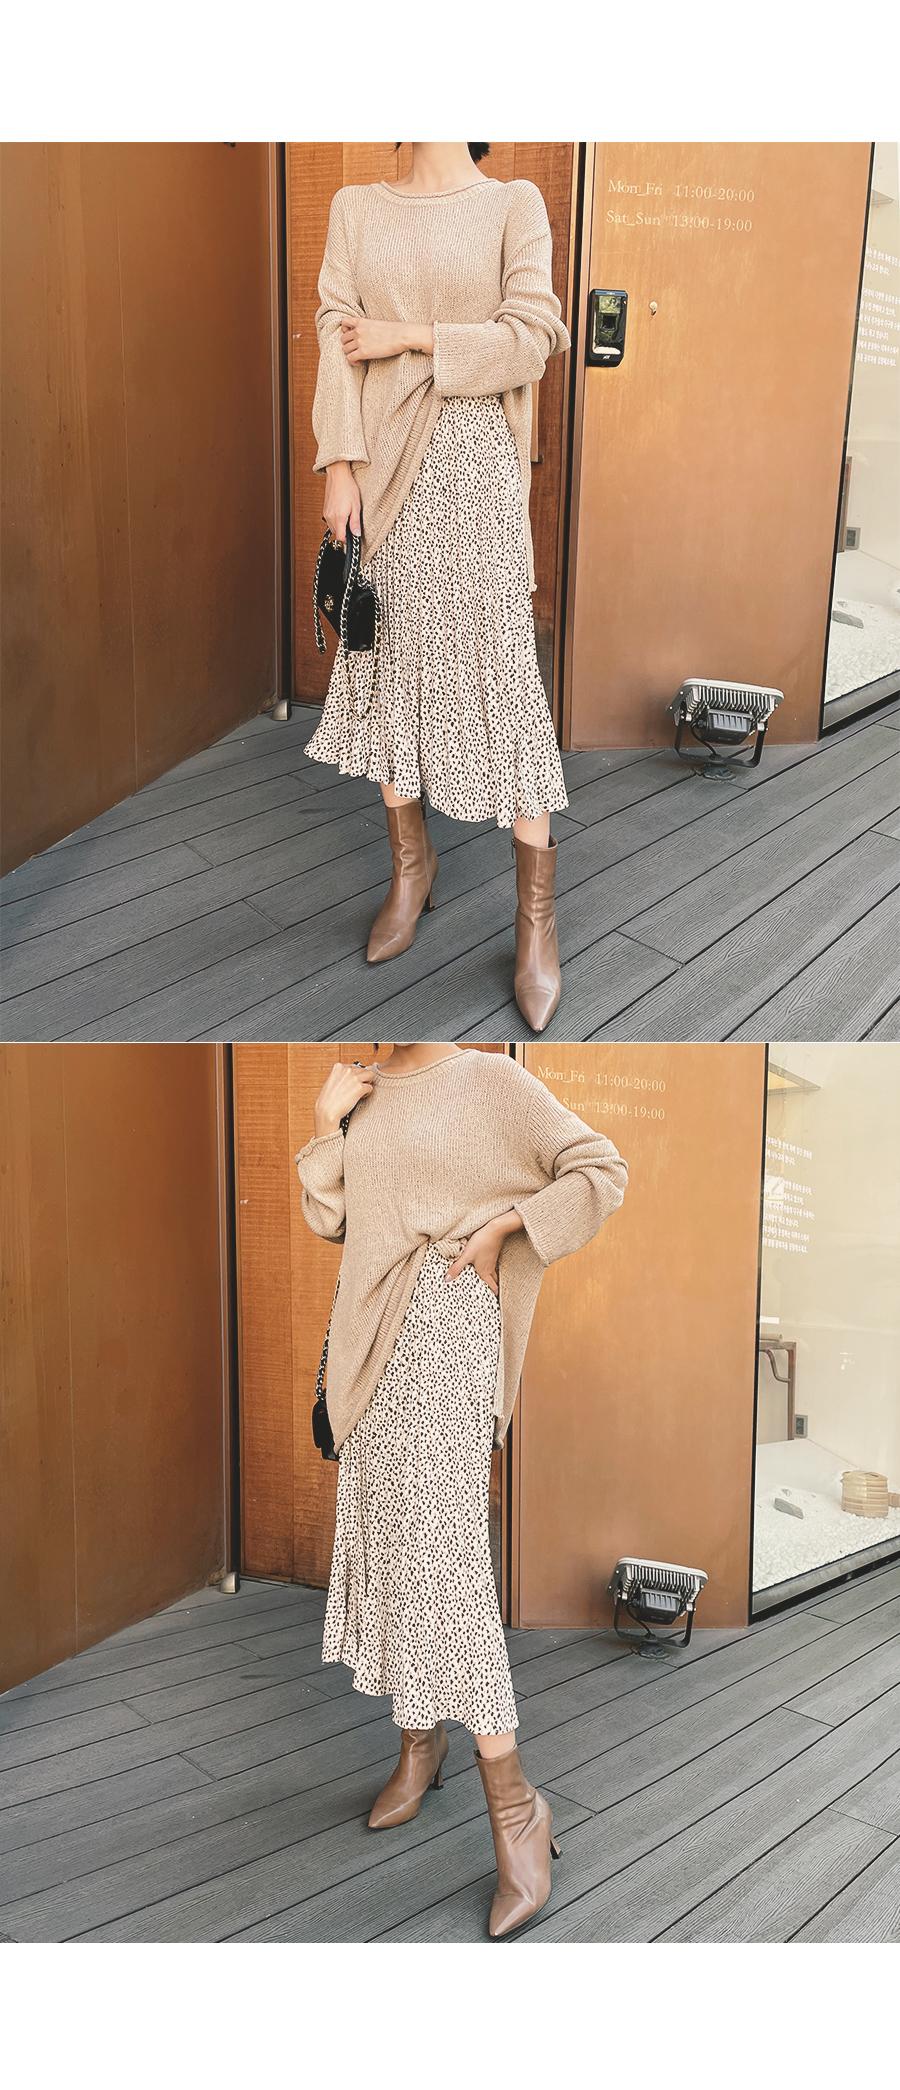 dress model image-S7L3